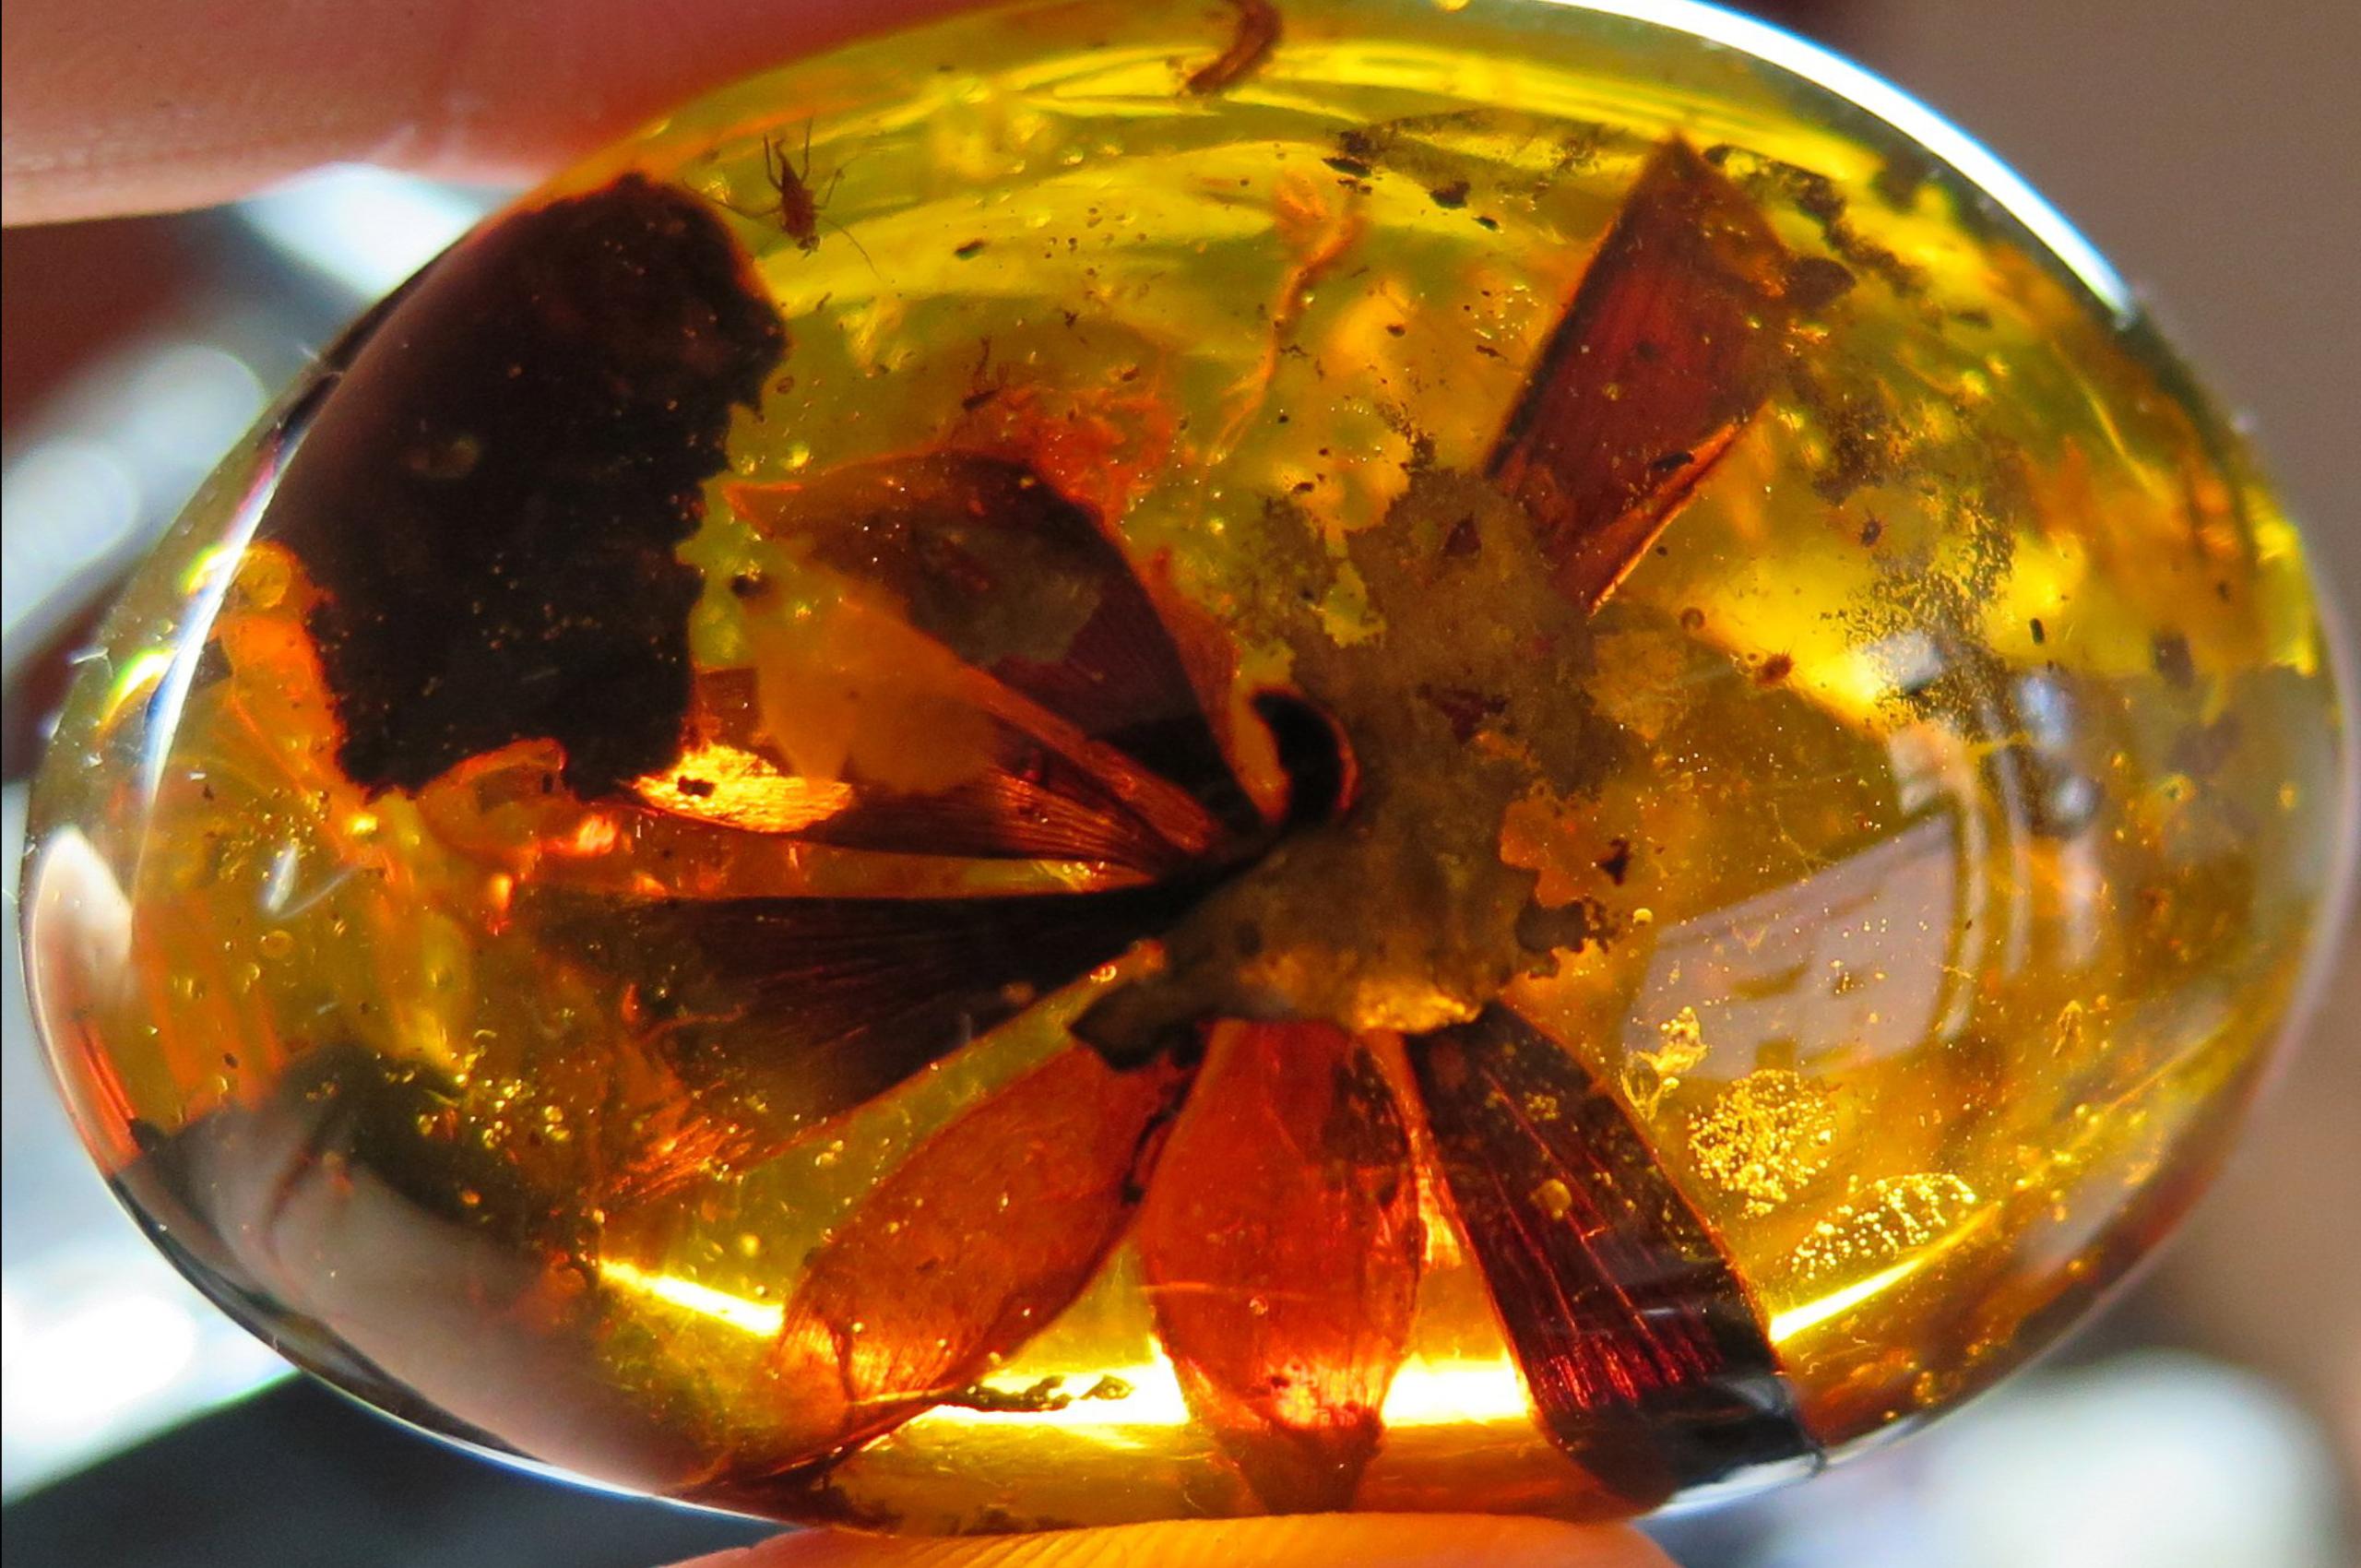 Flower-in-myanmar-amber.-Photo-by-Federico-Barlocher